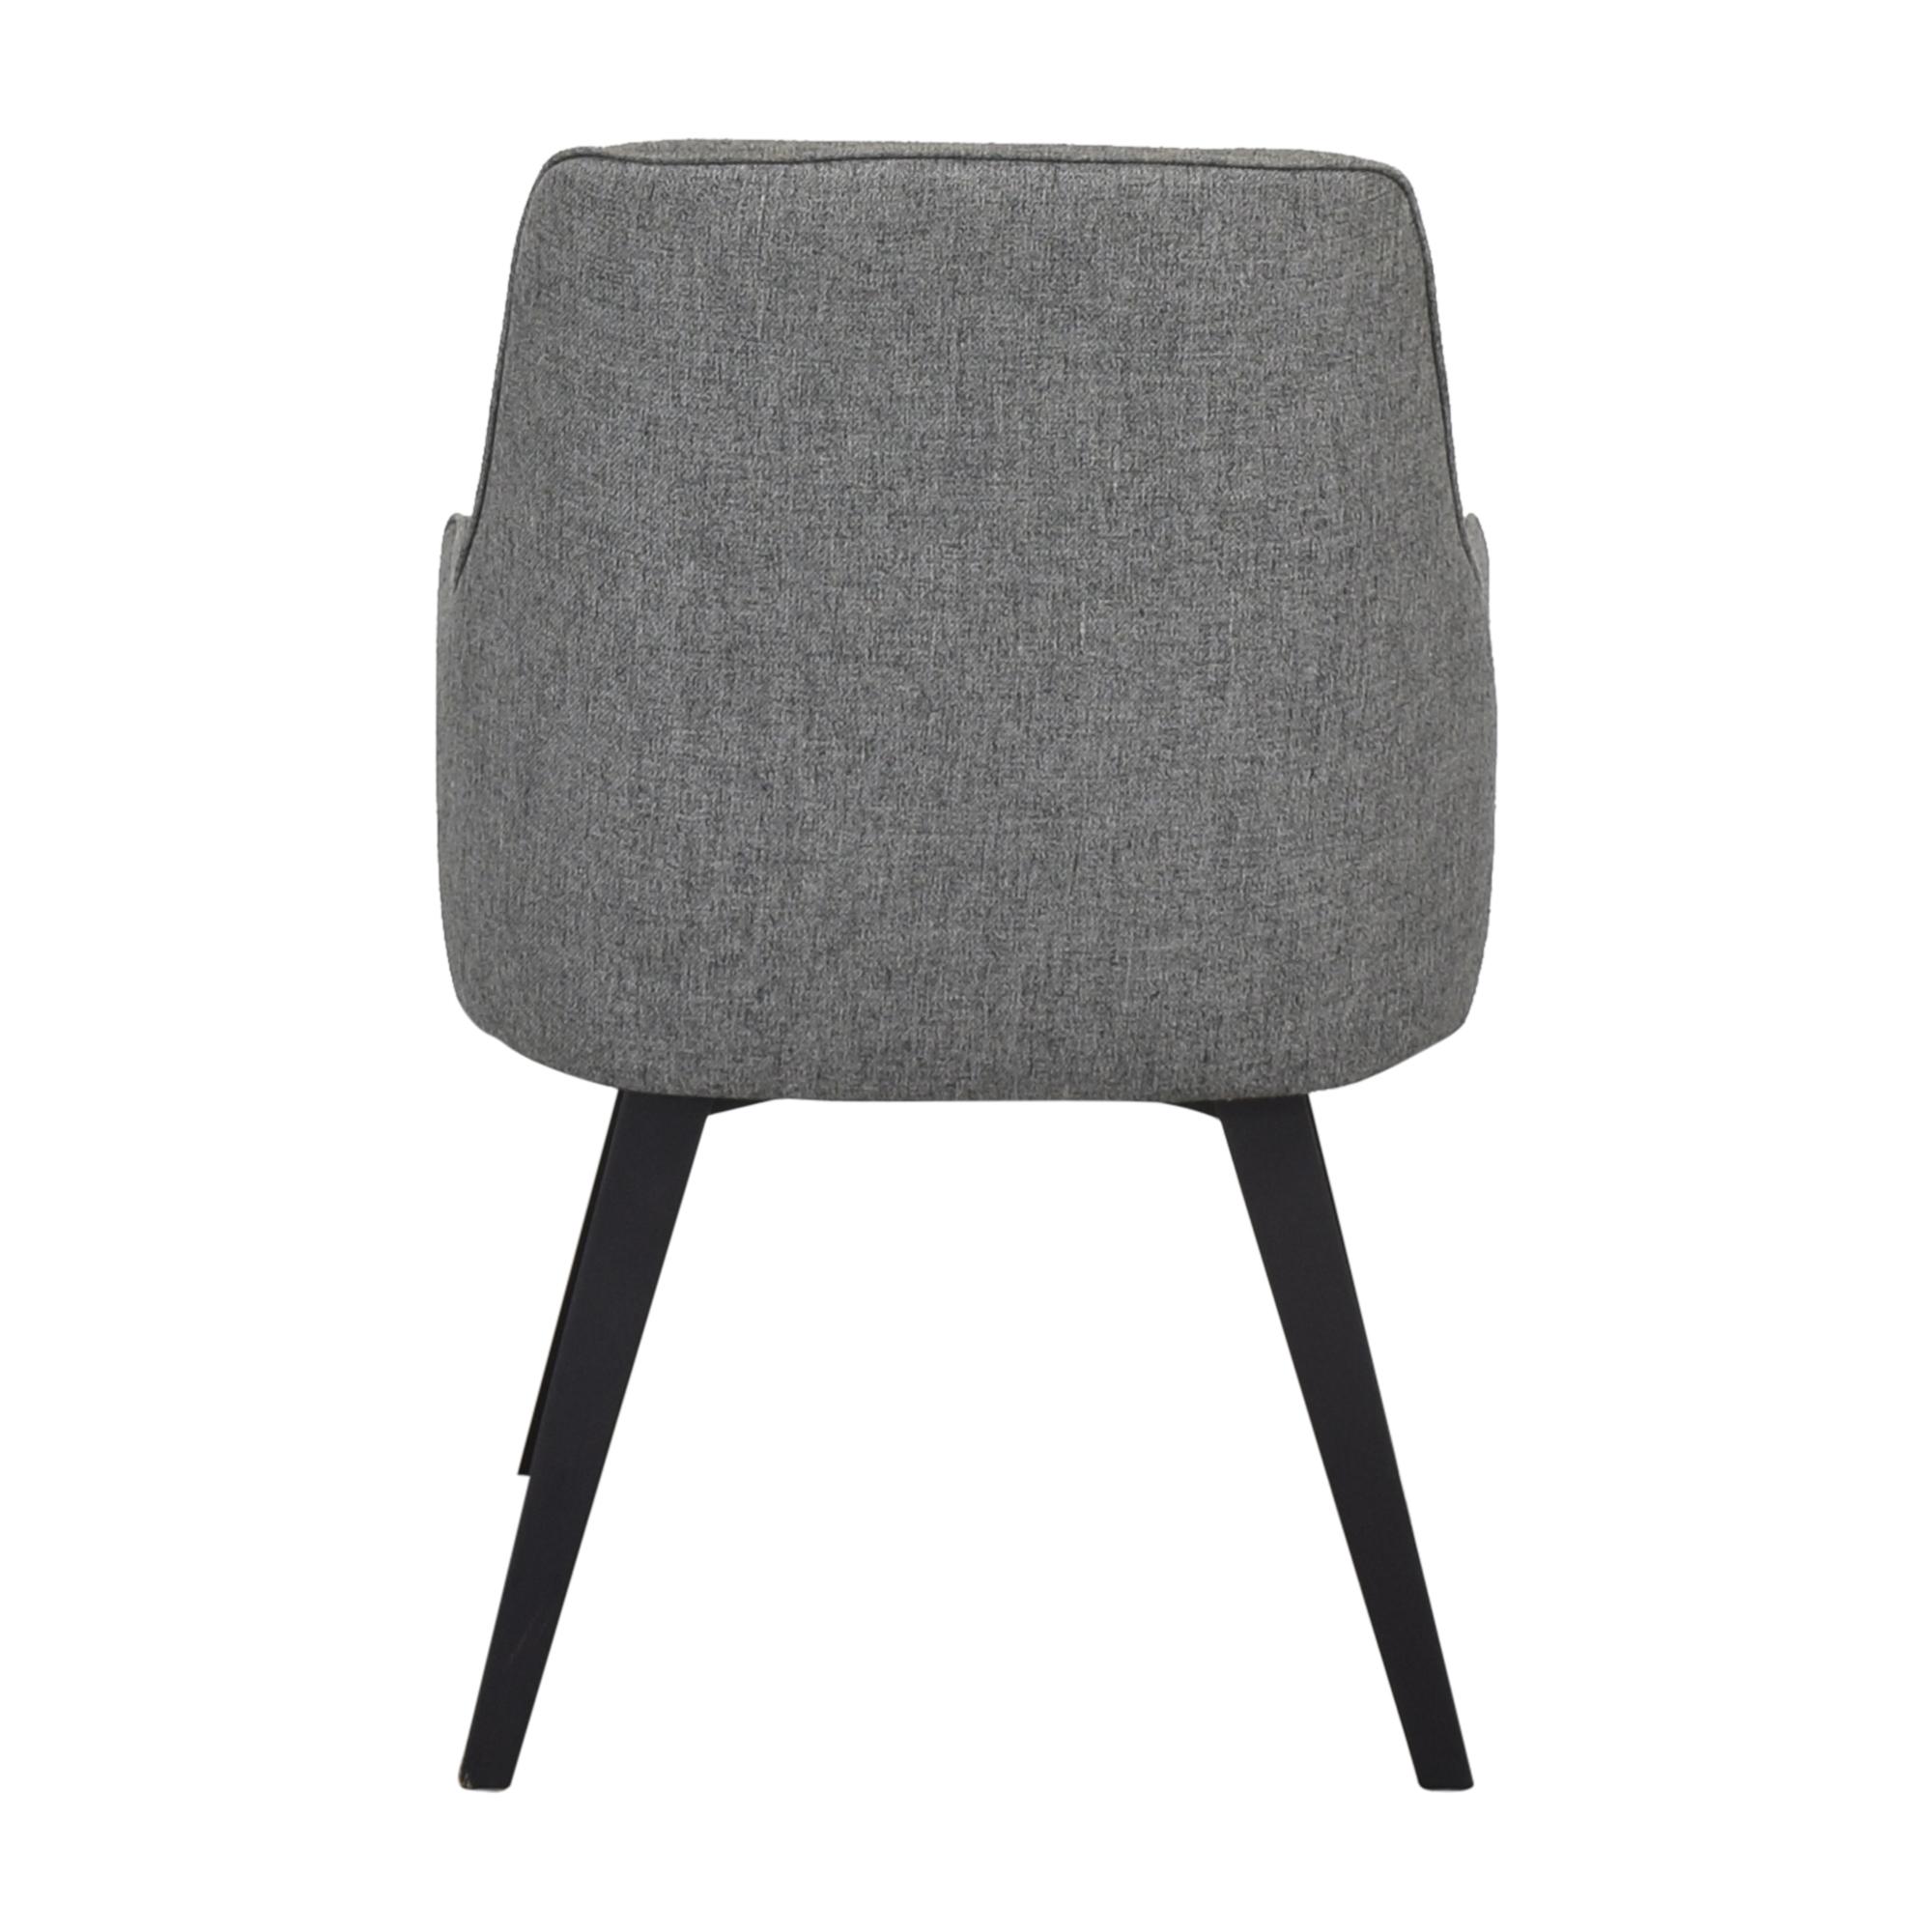 Crate & Barrel Crate & Barrel Harvey Swivel Chair on sale